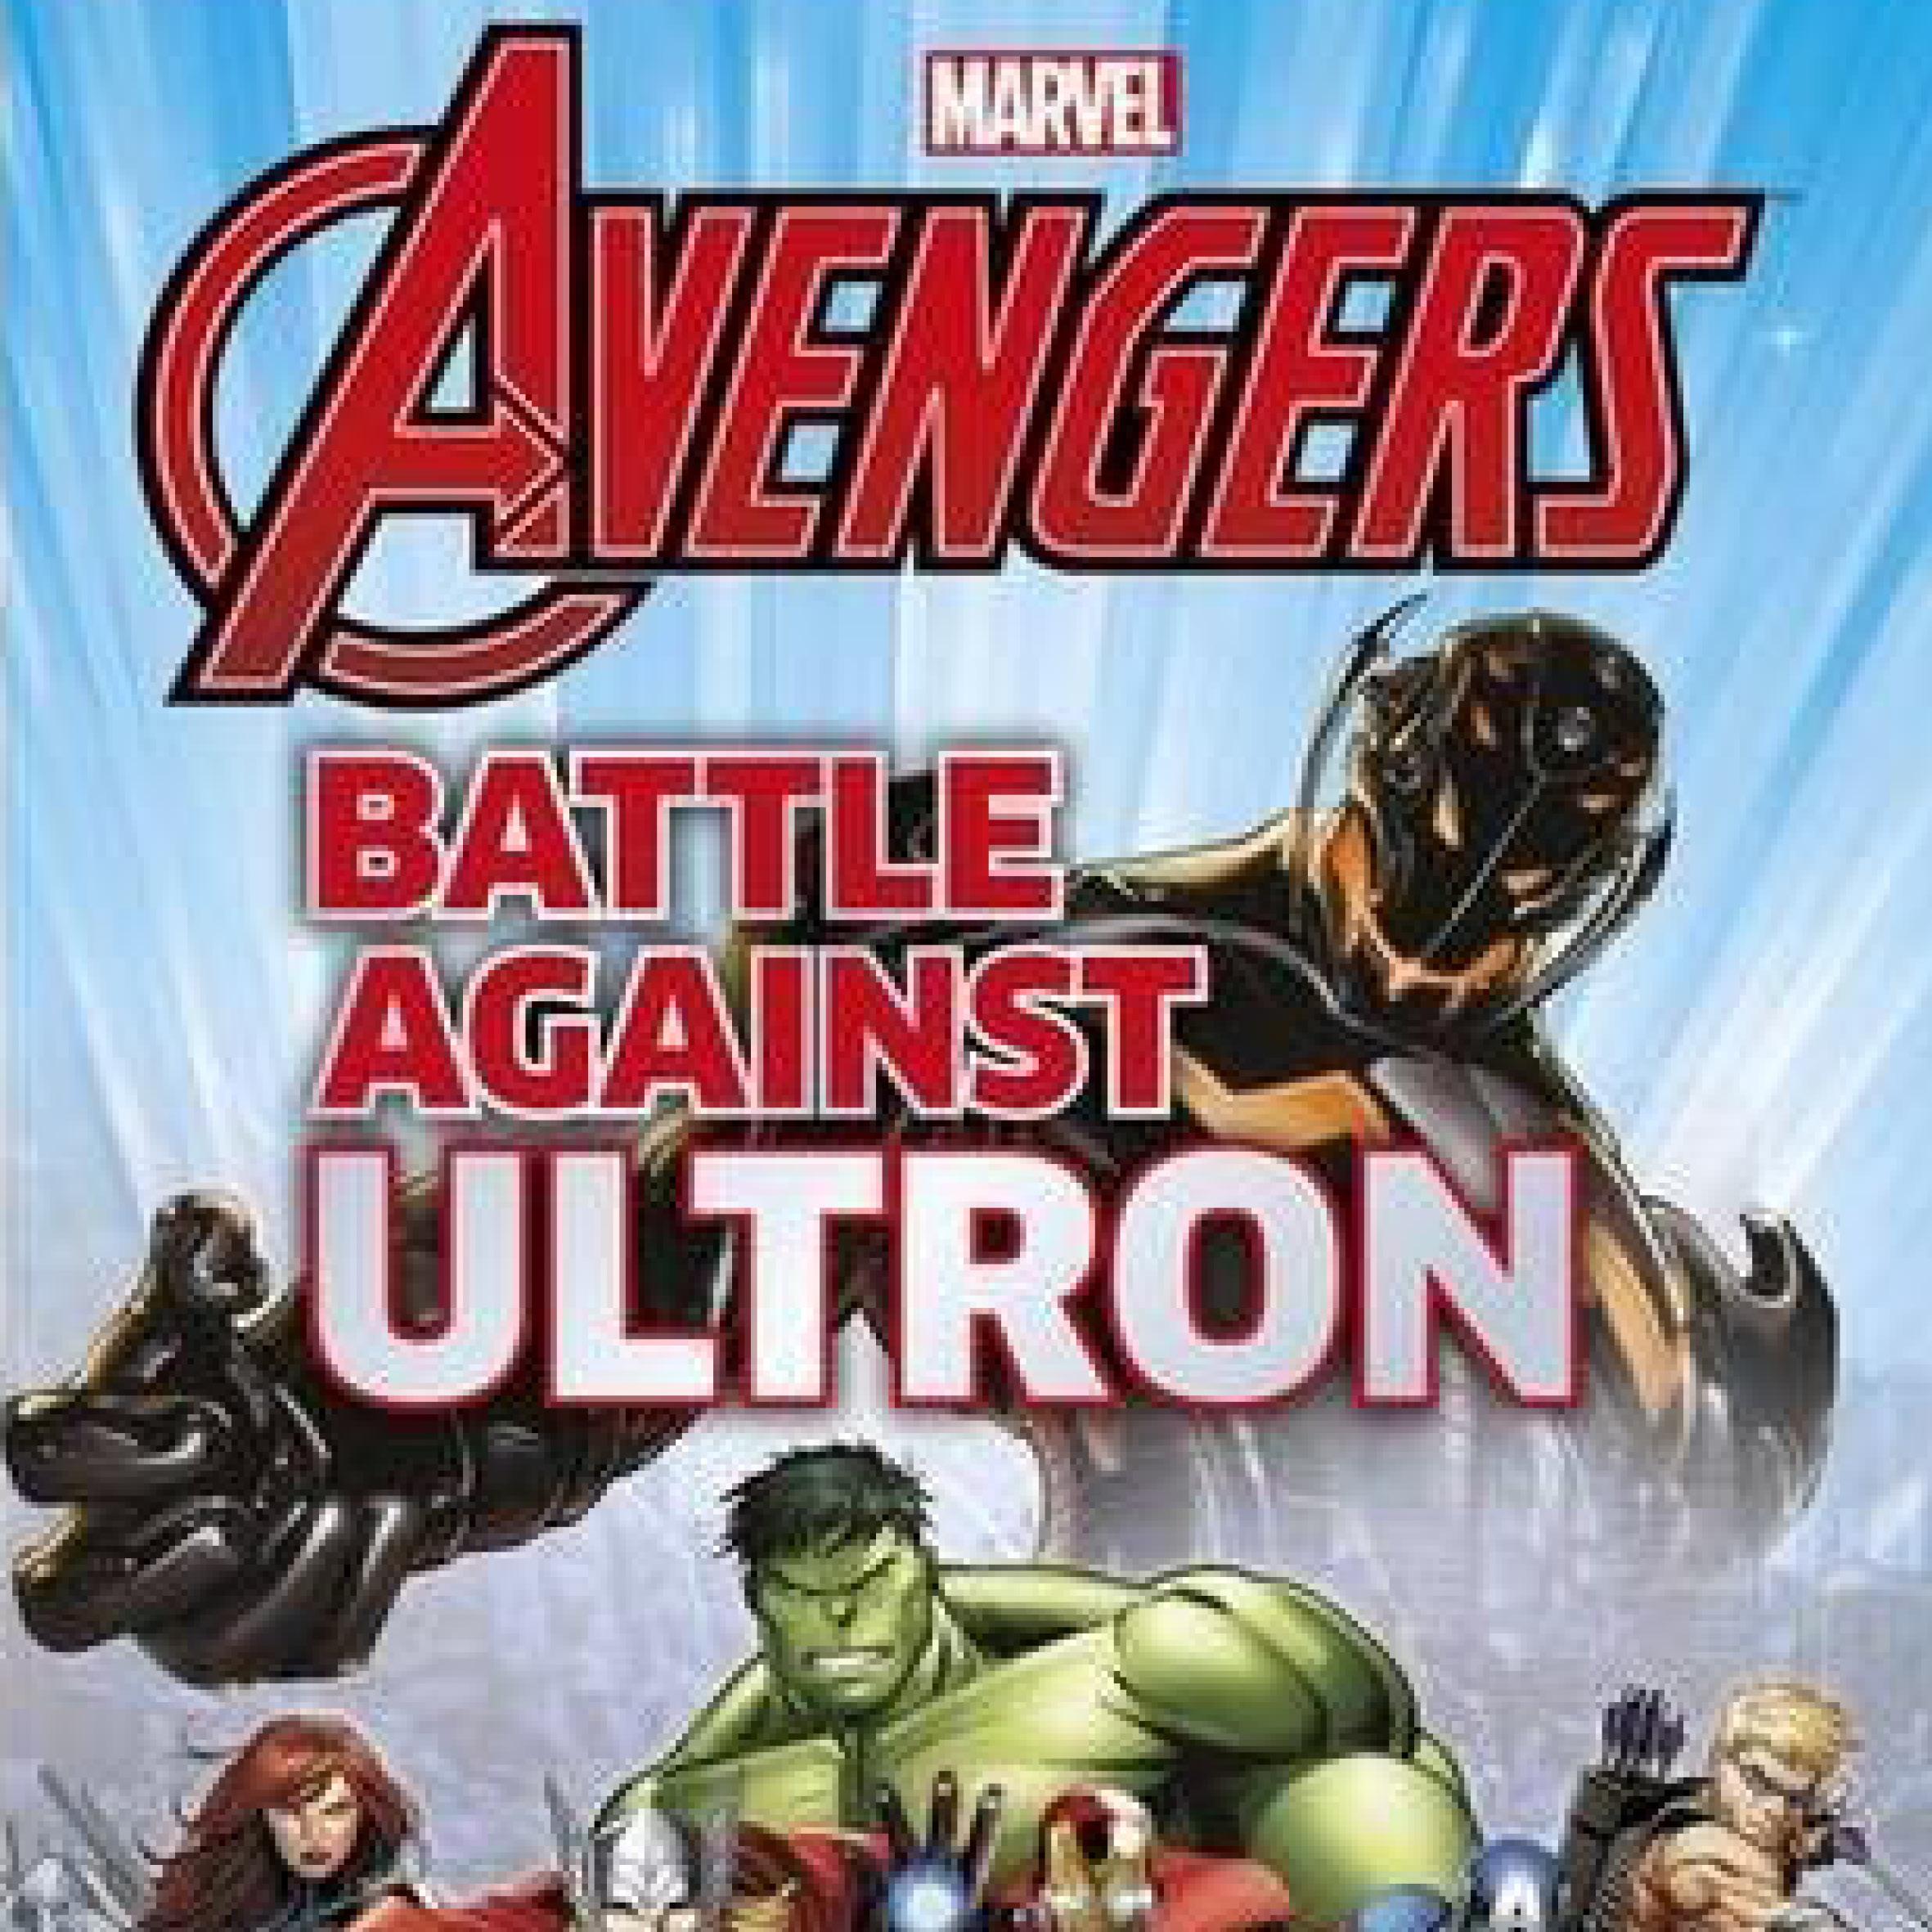 7 Dynamo Avengers Ultron Reader_THUMB